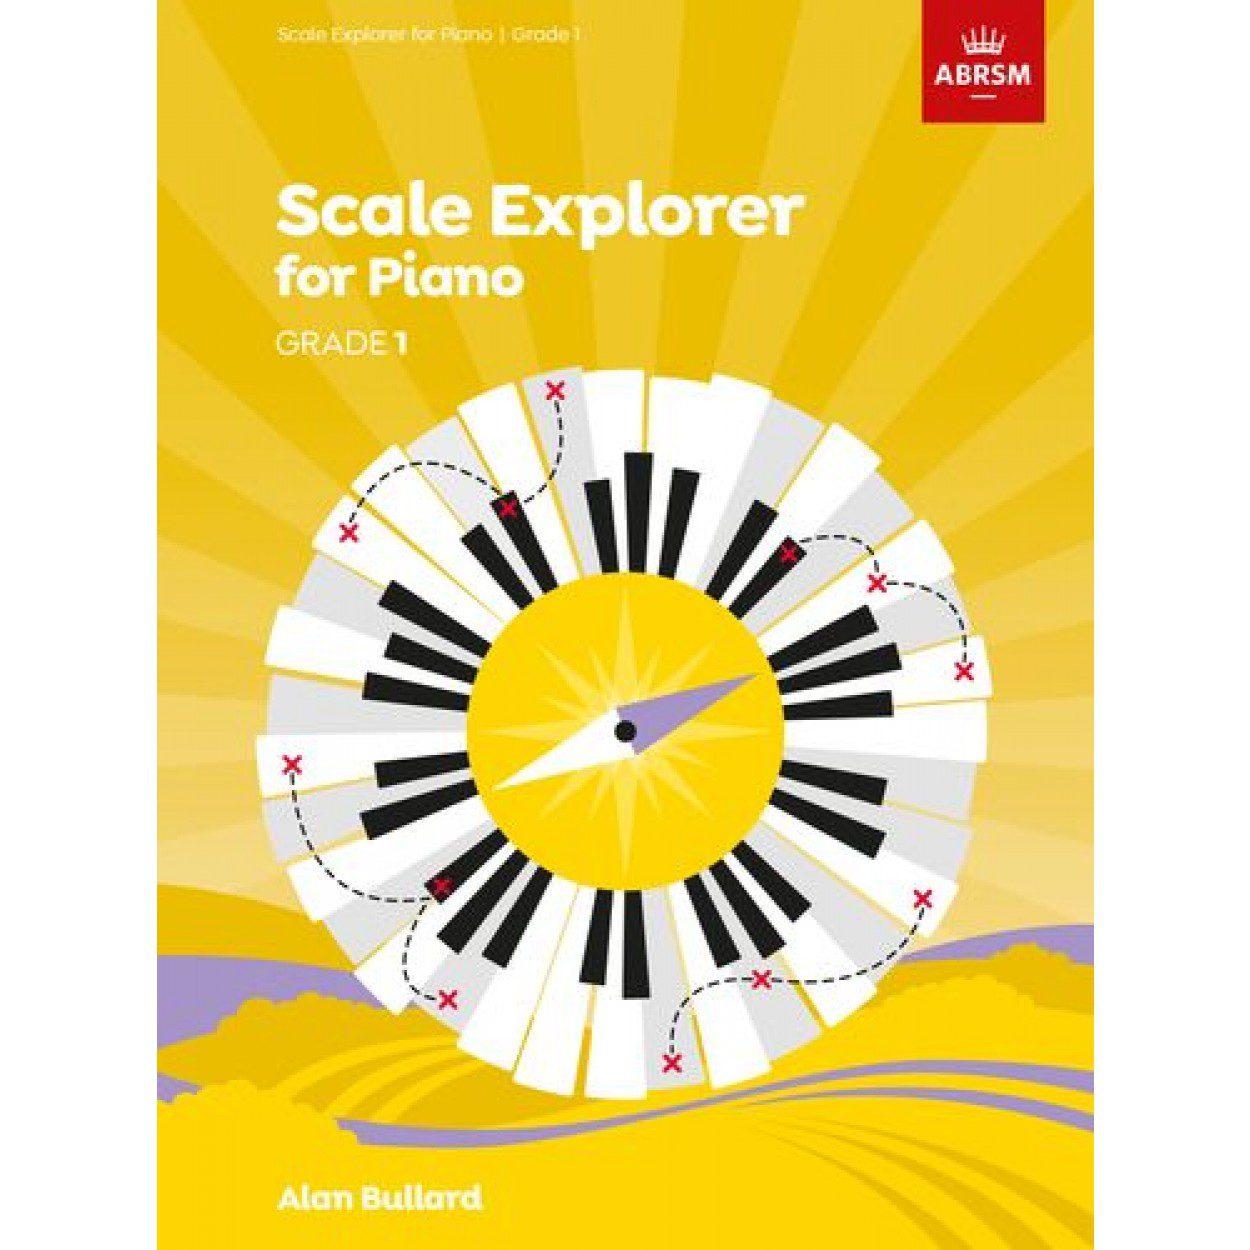 Scale Explorer for Piano Grade 1 available at Penarth Music Centre